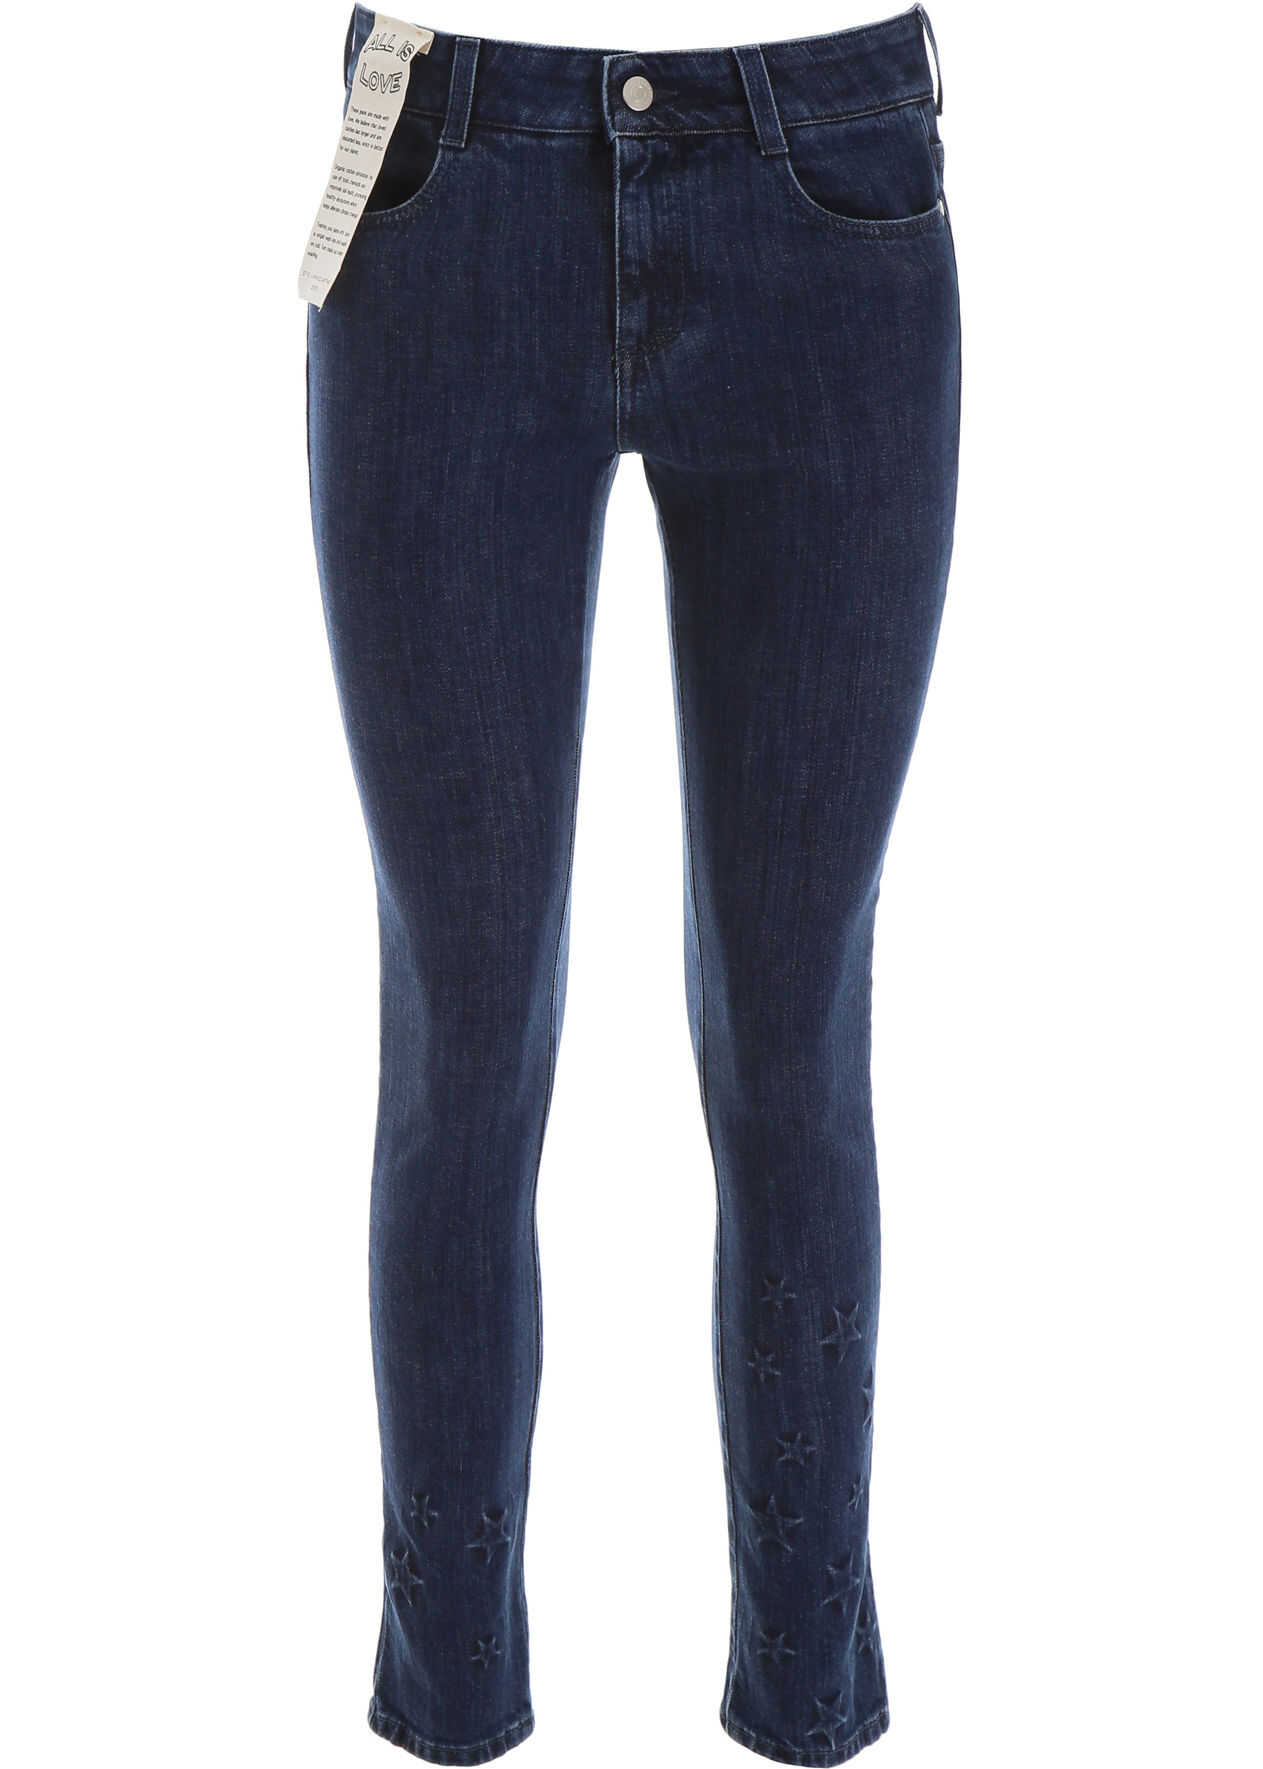 adidas by Stella McCartney Stars Skinny Jeans RETRO BLUE